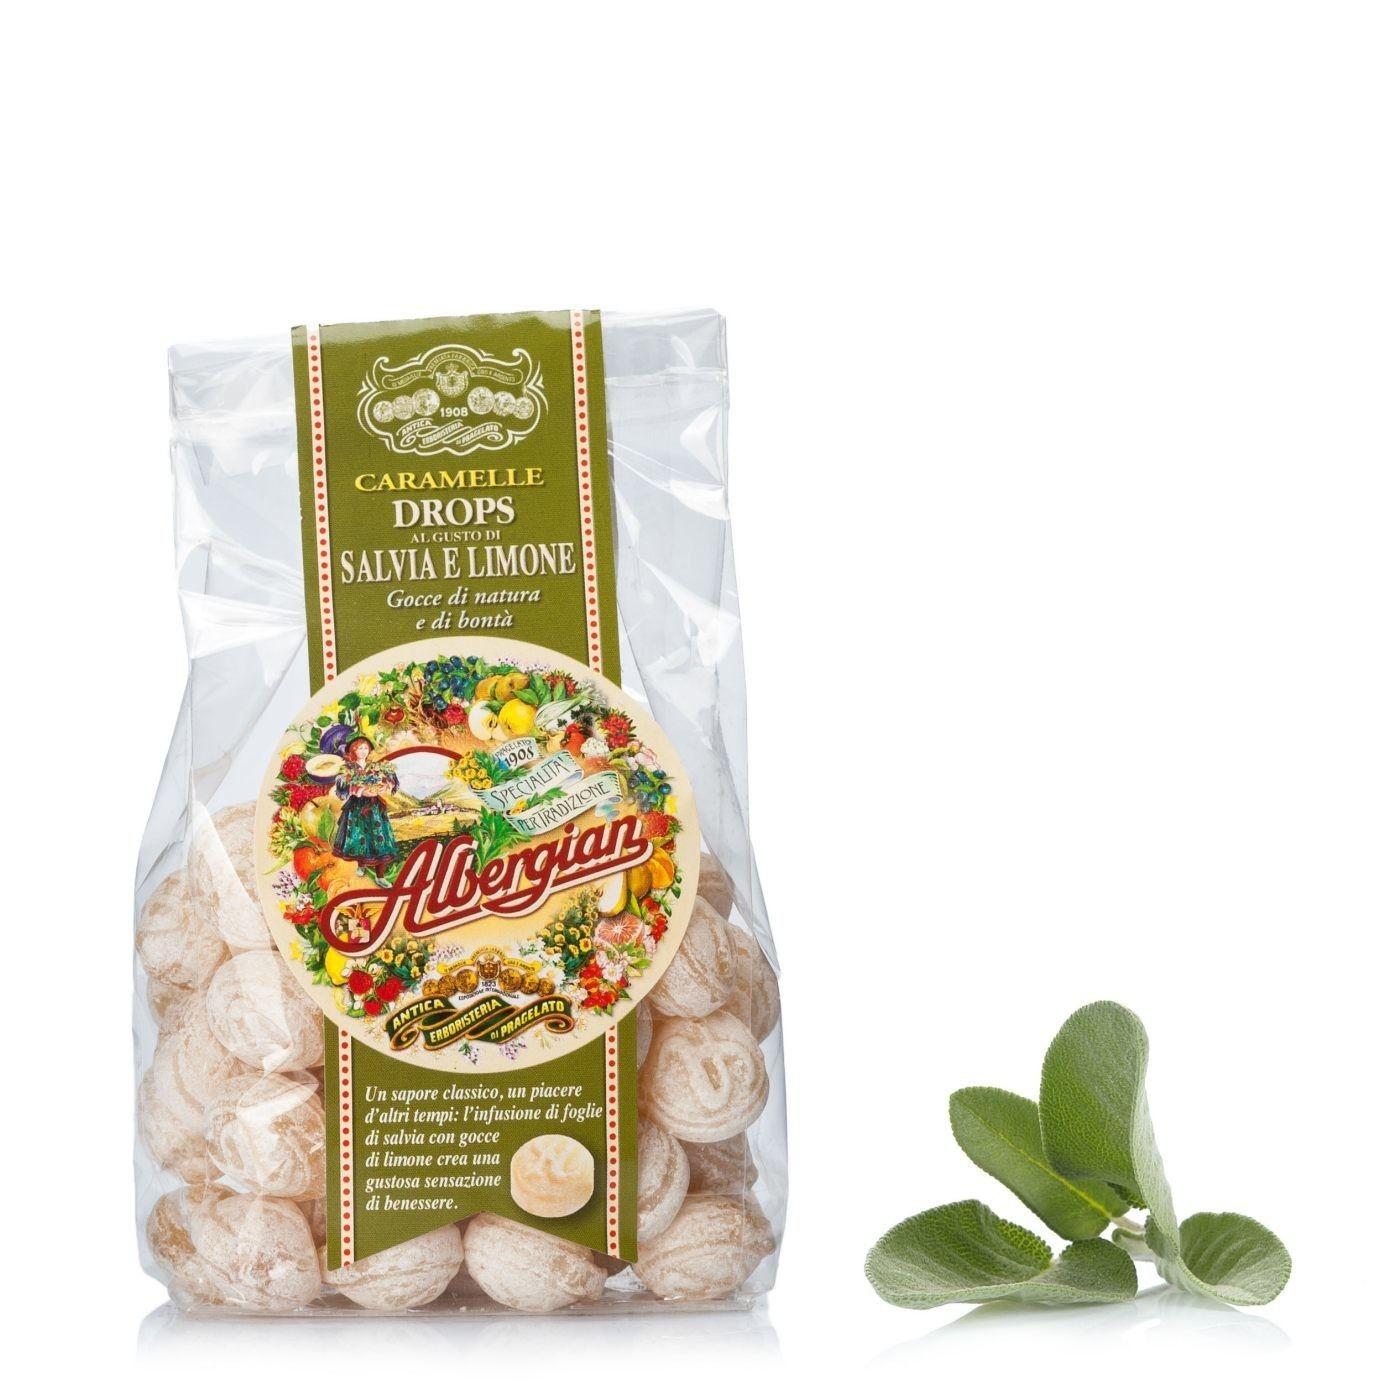 Lemon and Sage Candy Drops 5.3 oz